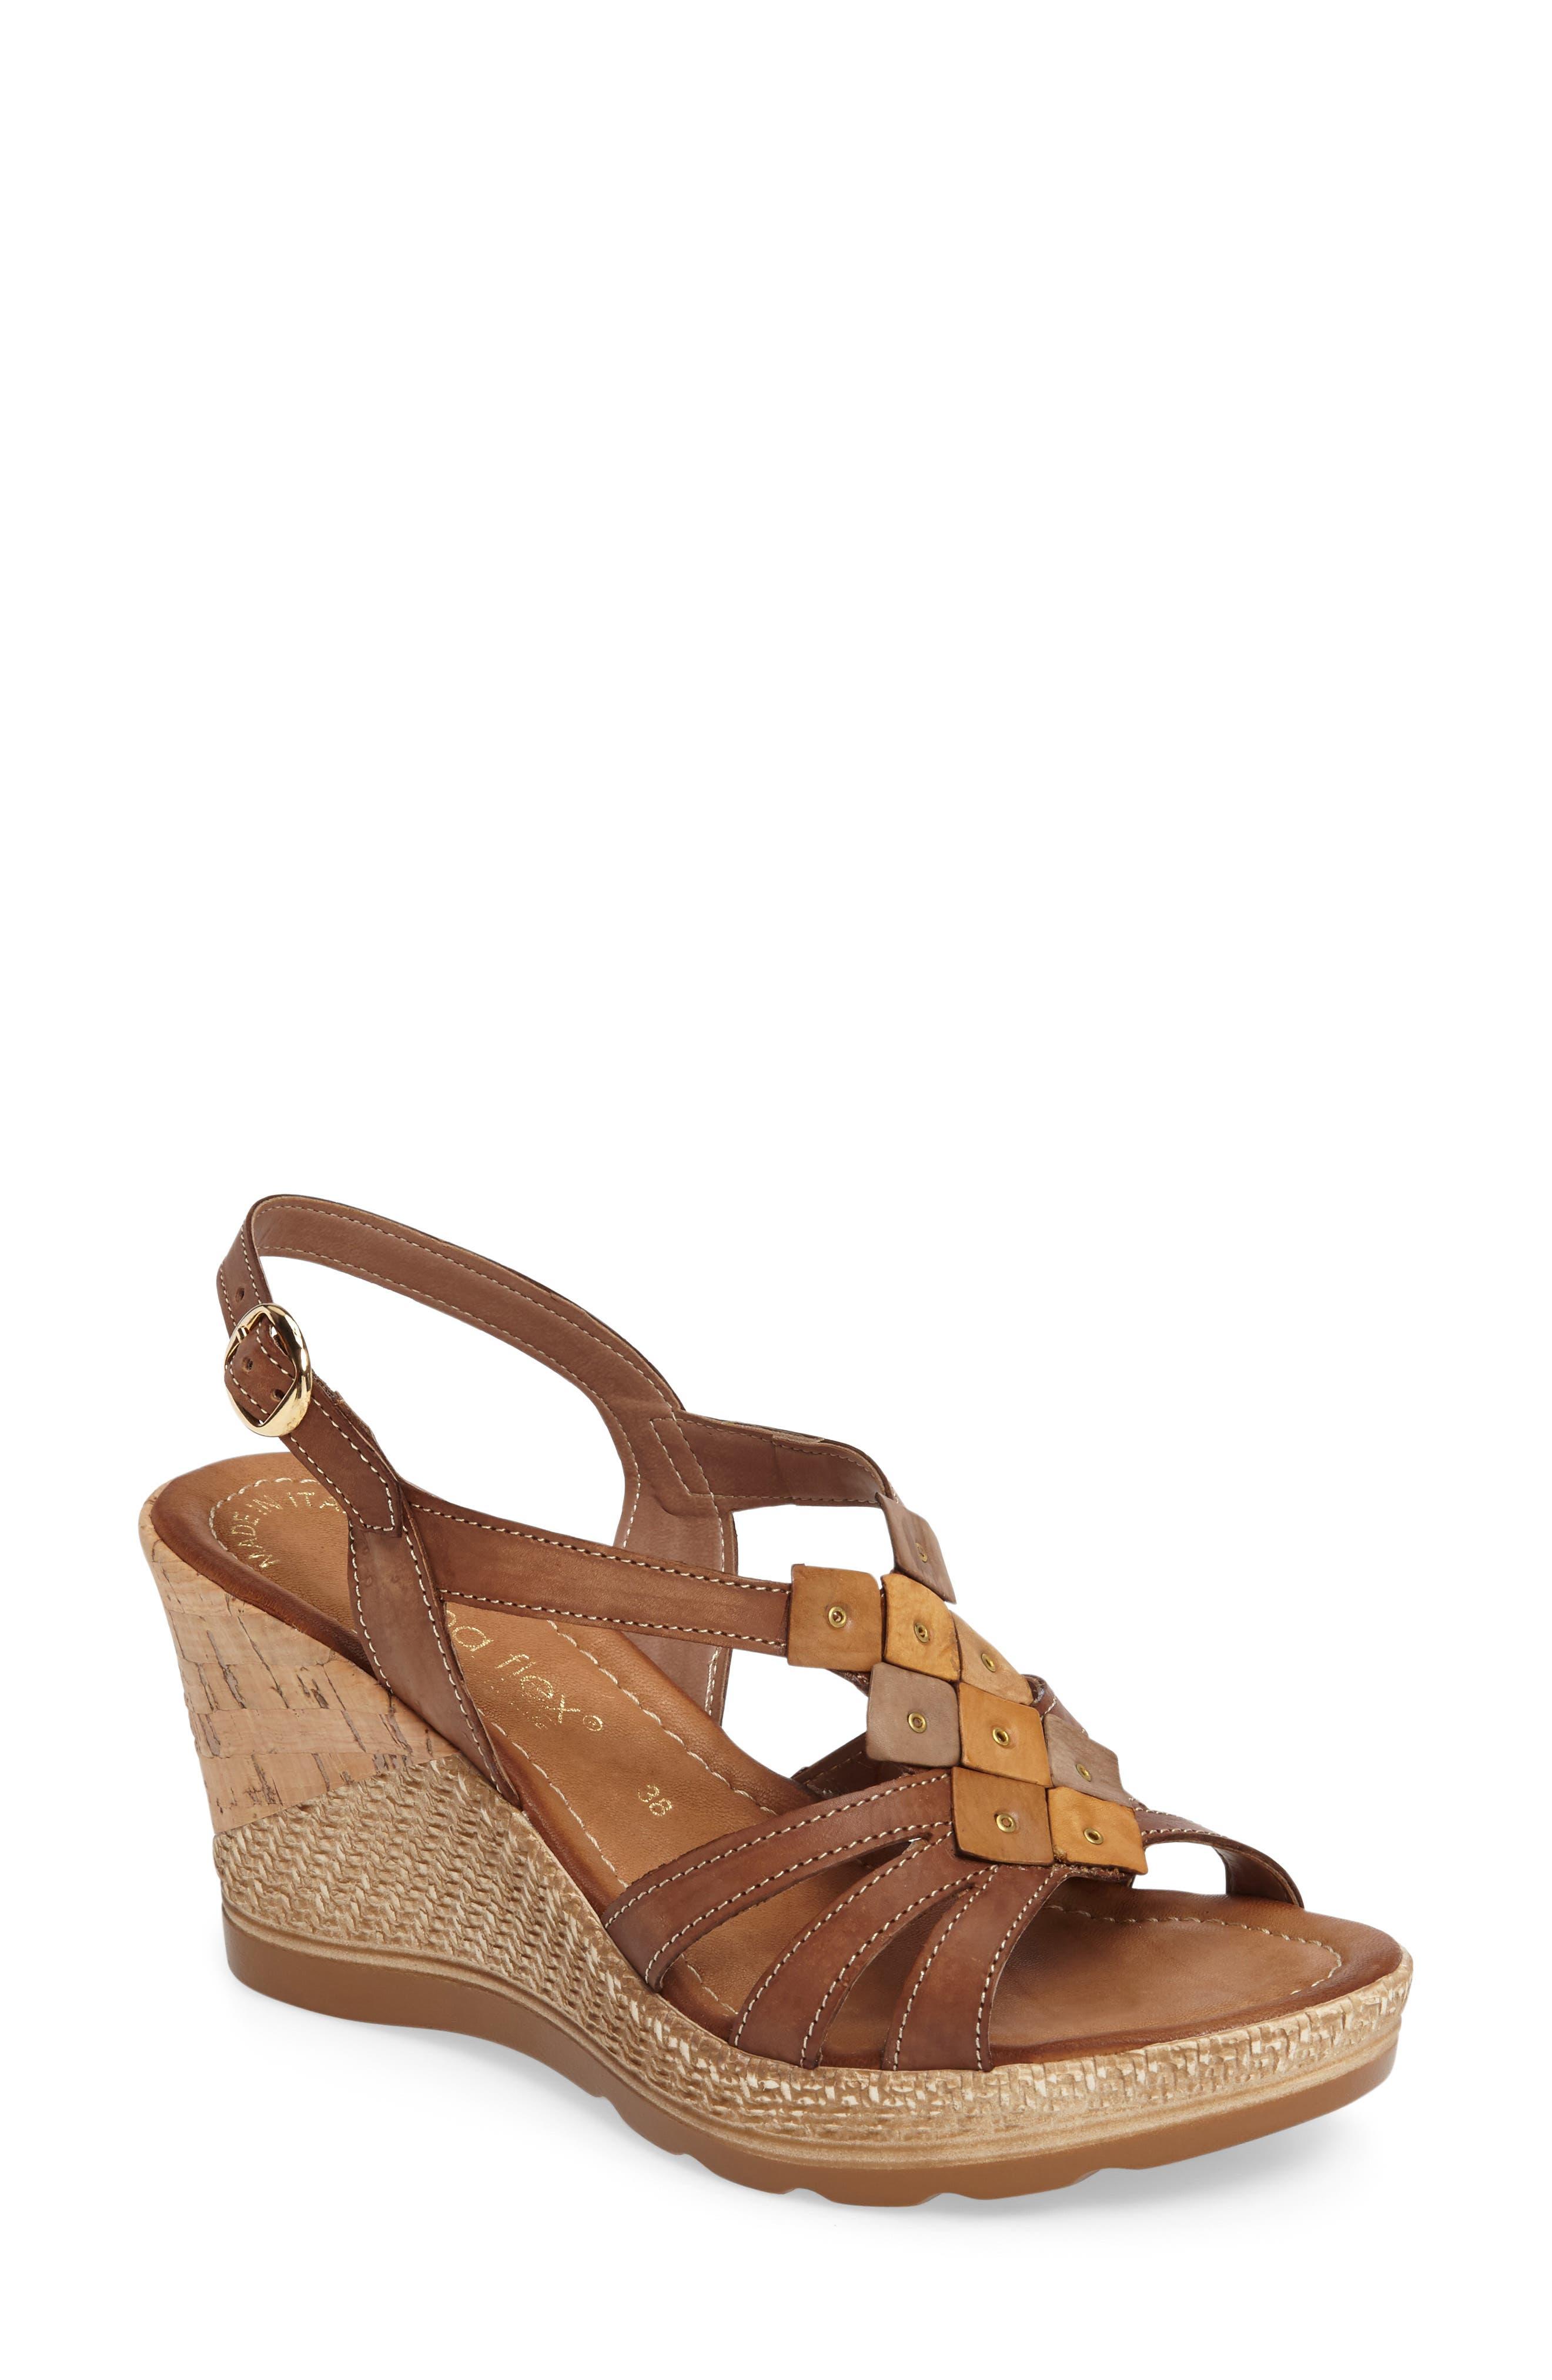 Main Image - Napa Flex Bari Wedge Sandal (Women)